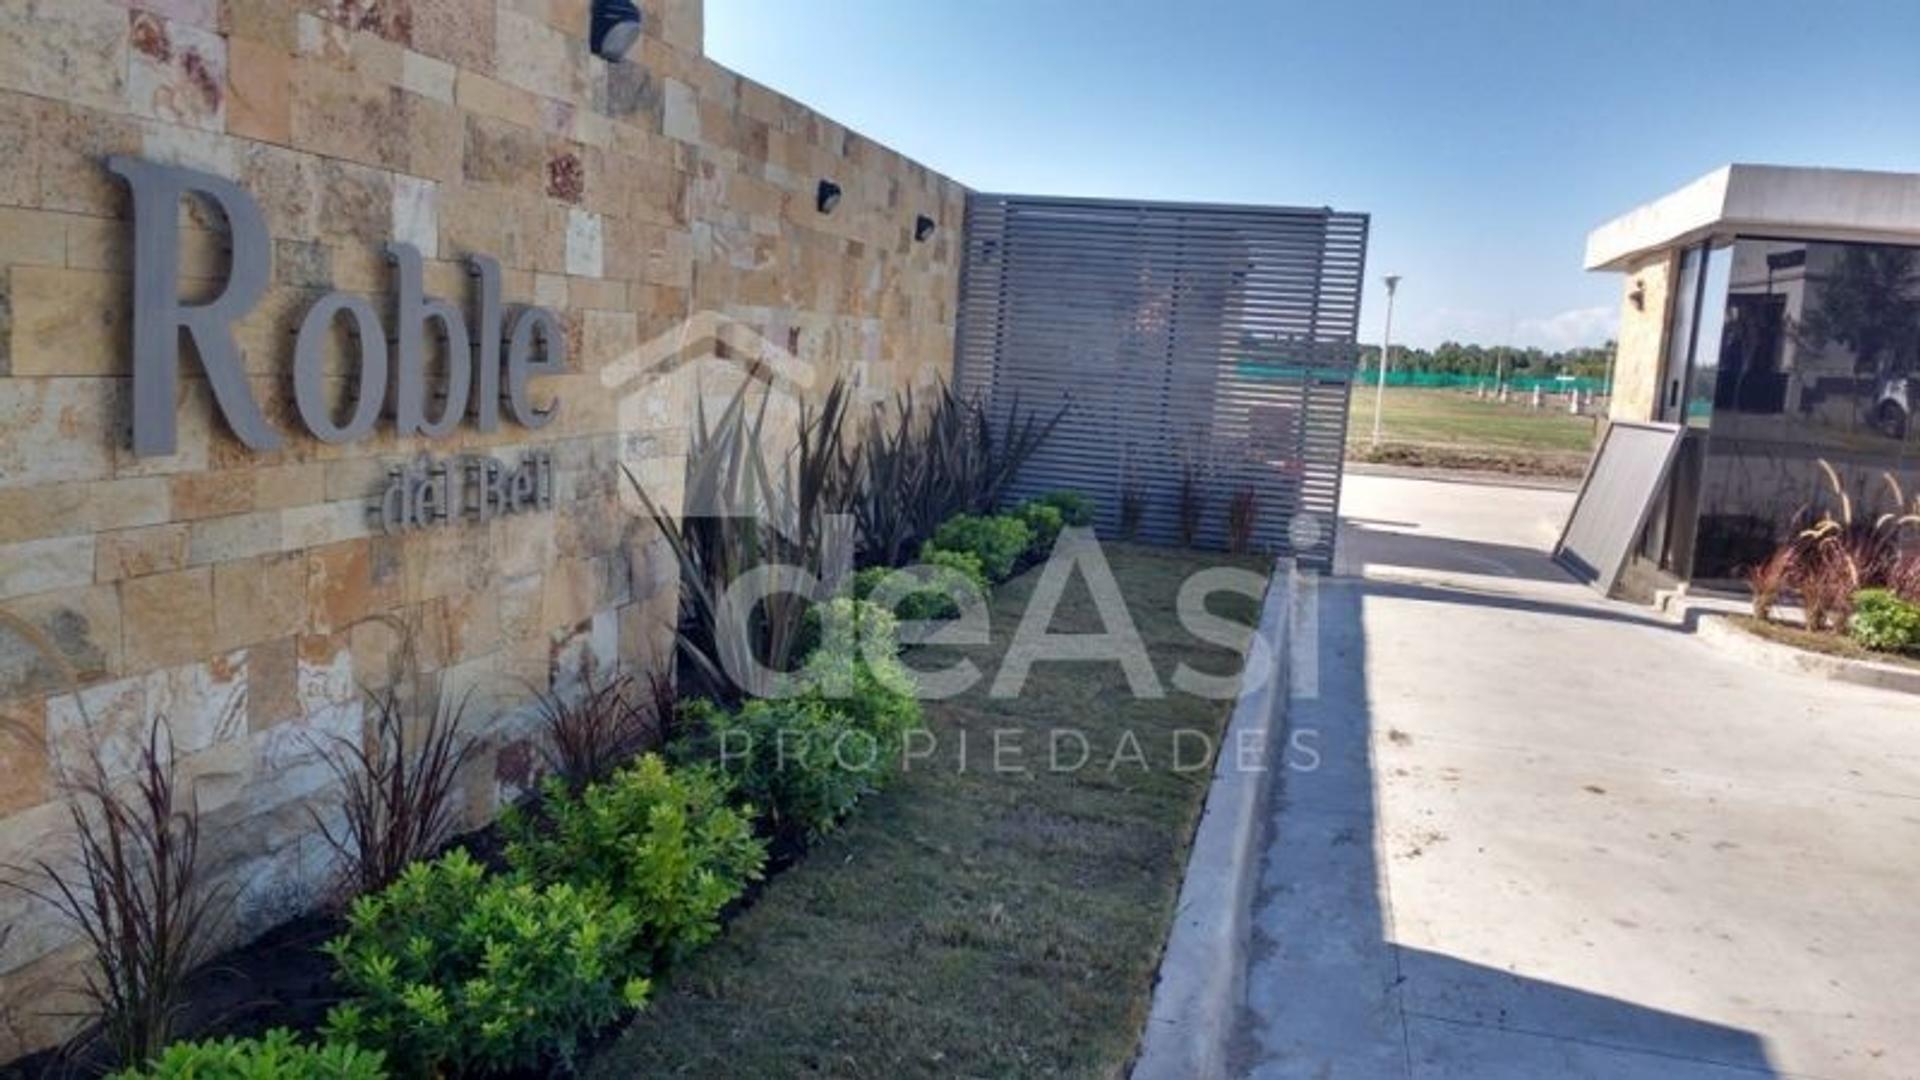 XINTEL(MDA-MDA-448) Lote - Venta - Argentina, La Plata - 133 100